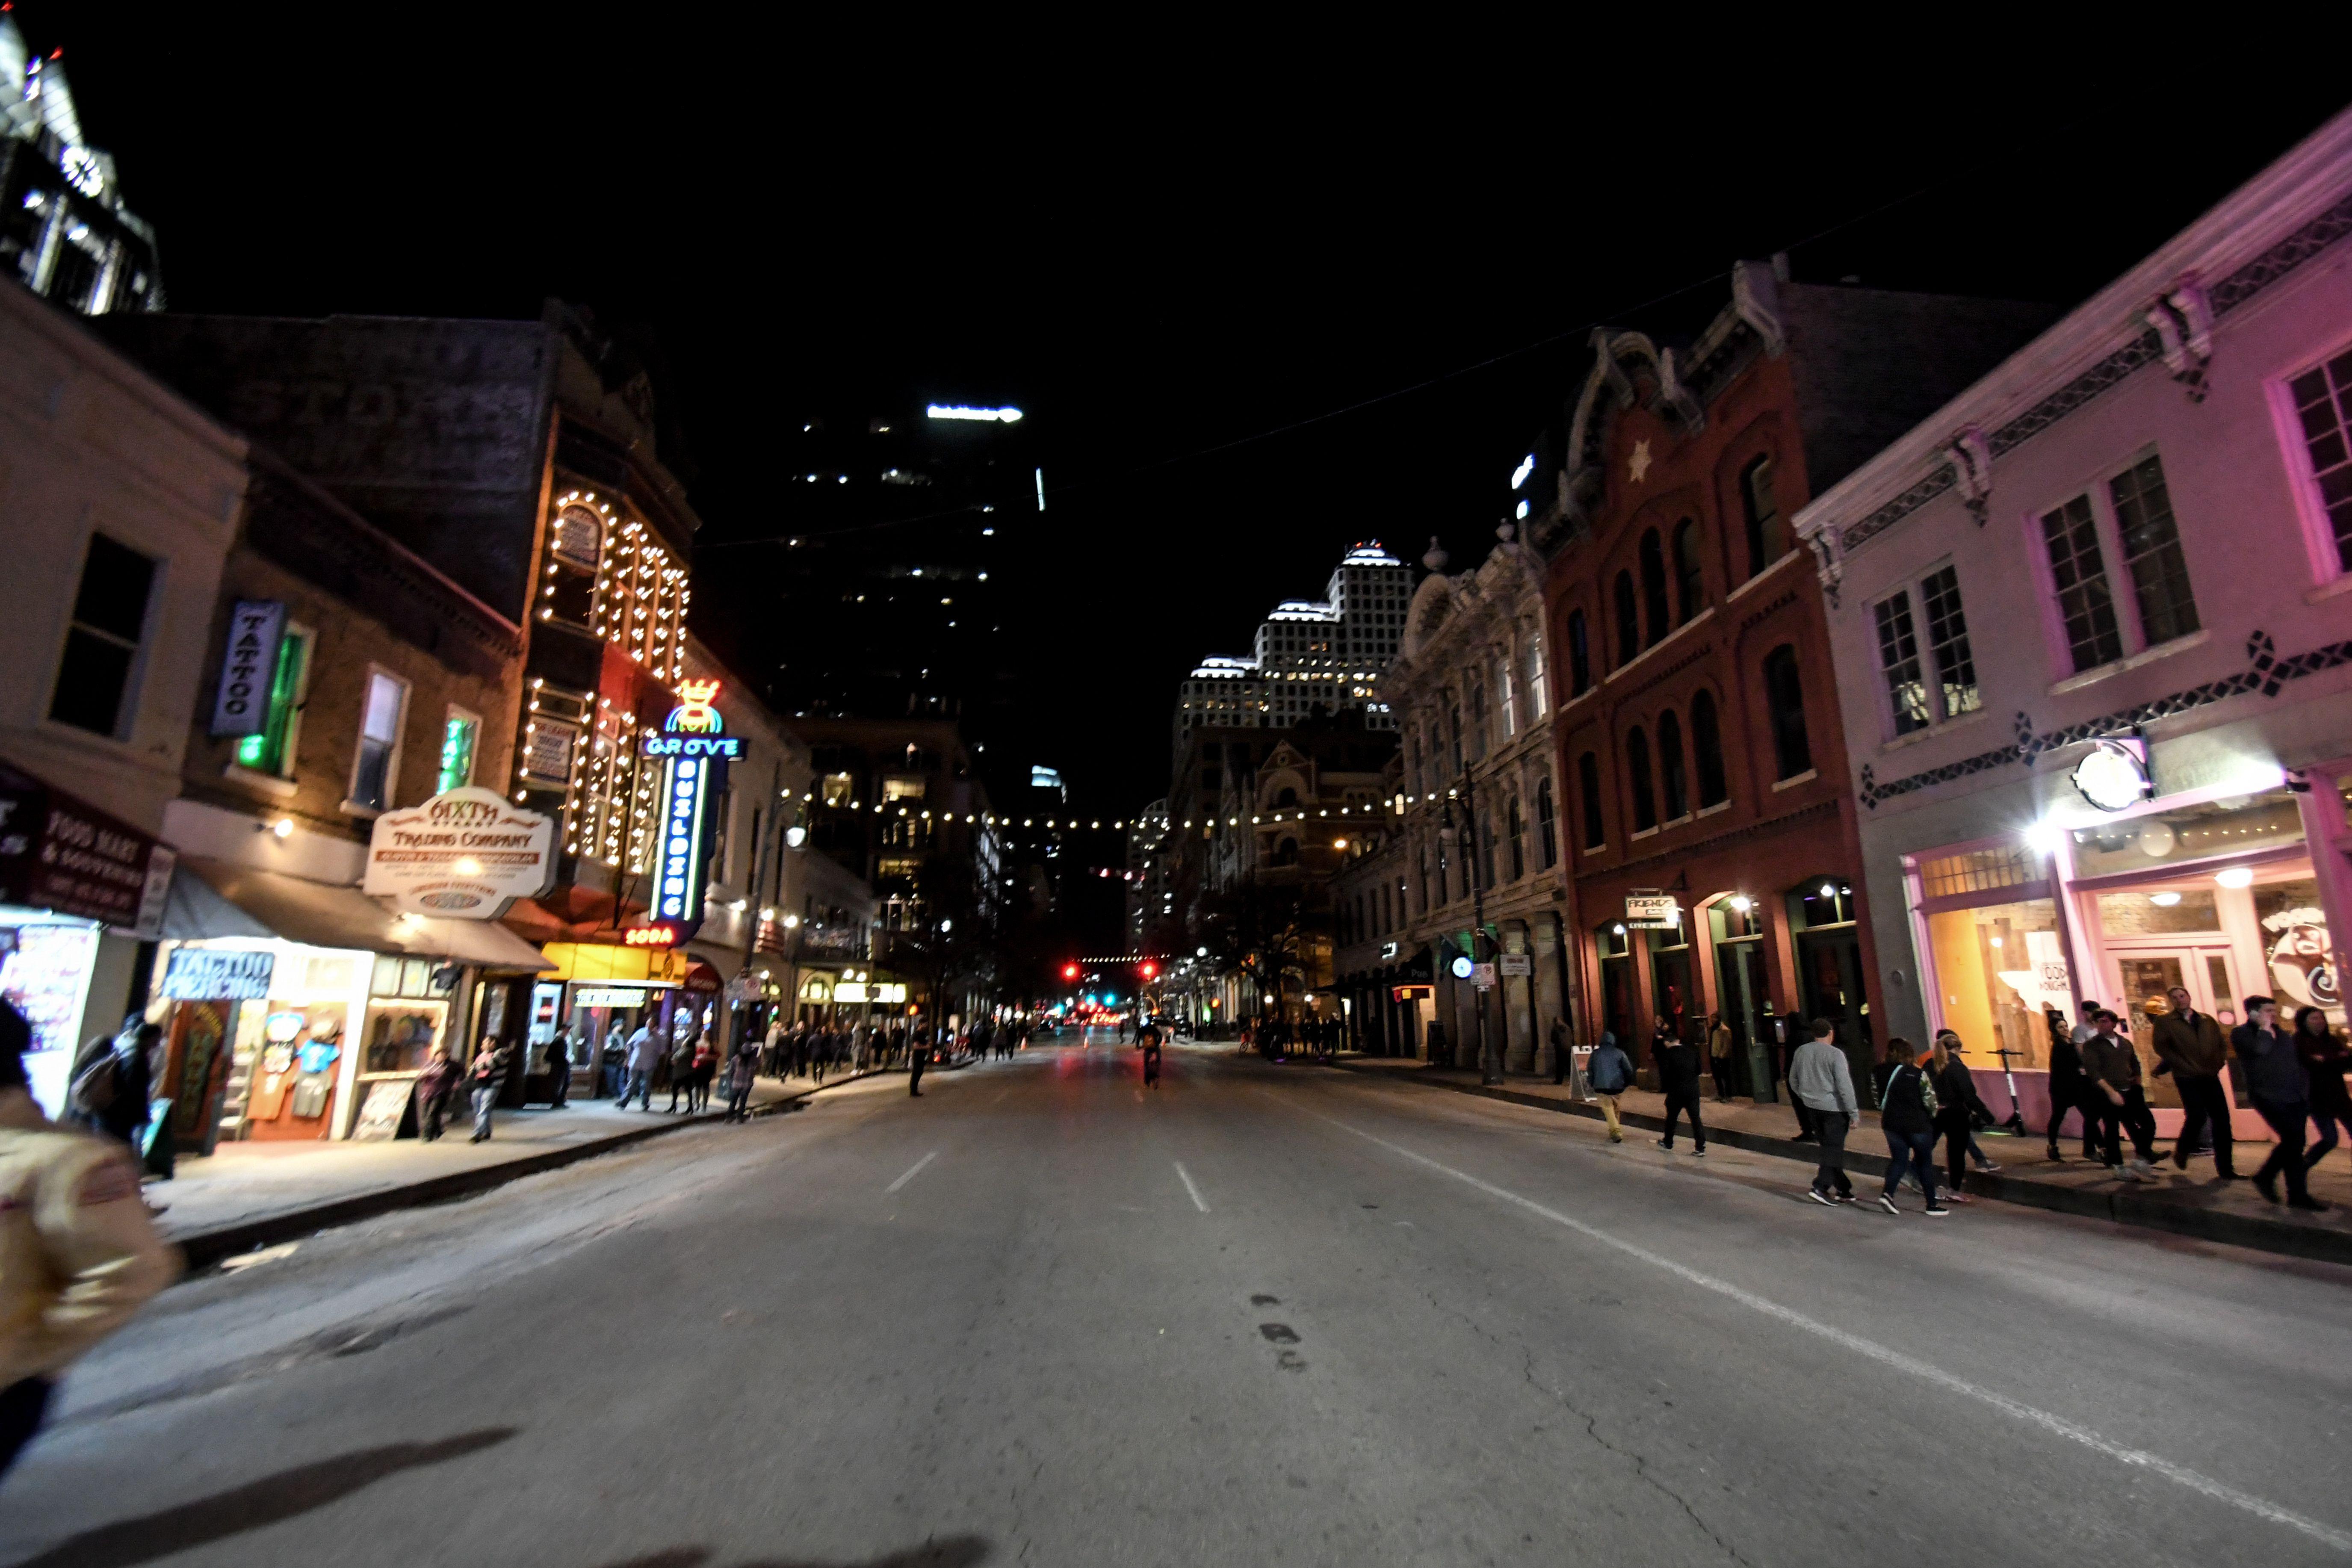 Una animada calle de Austin iluminada por la noche